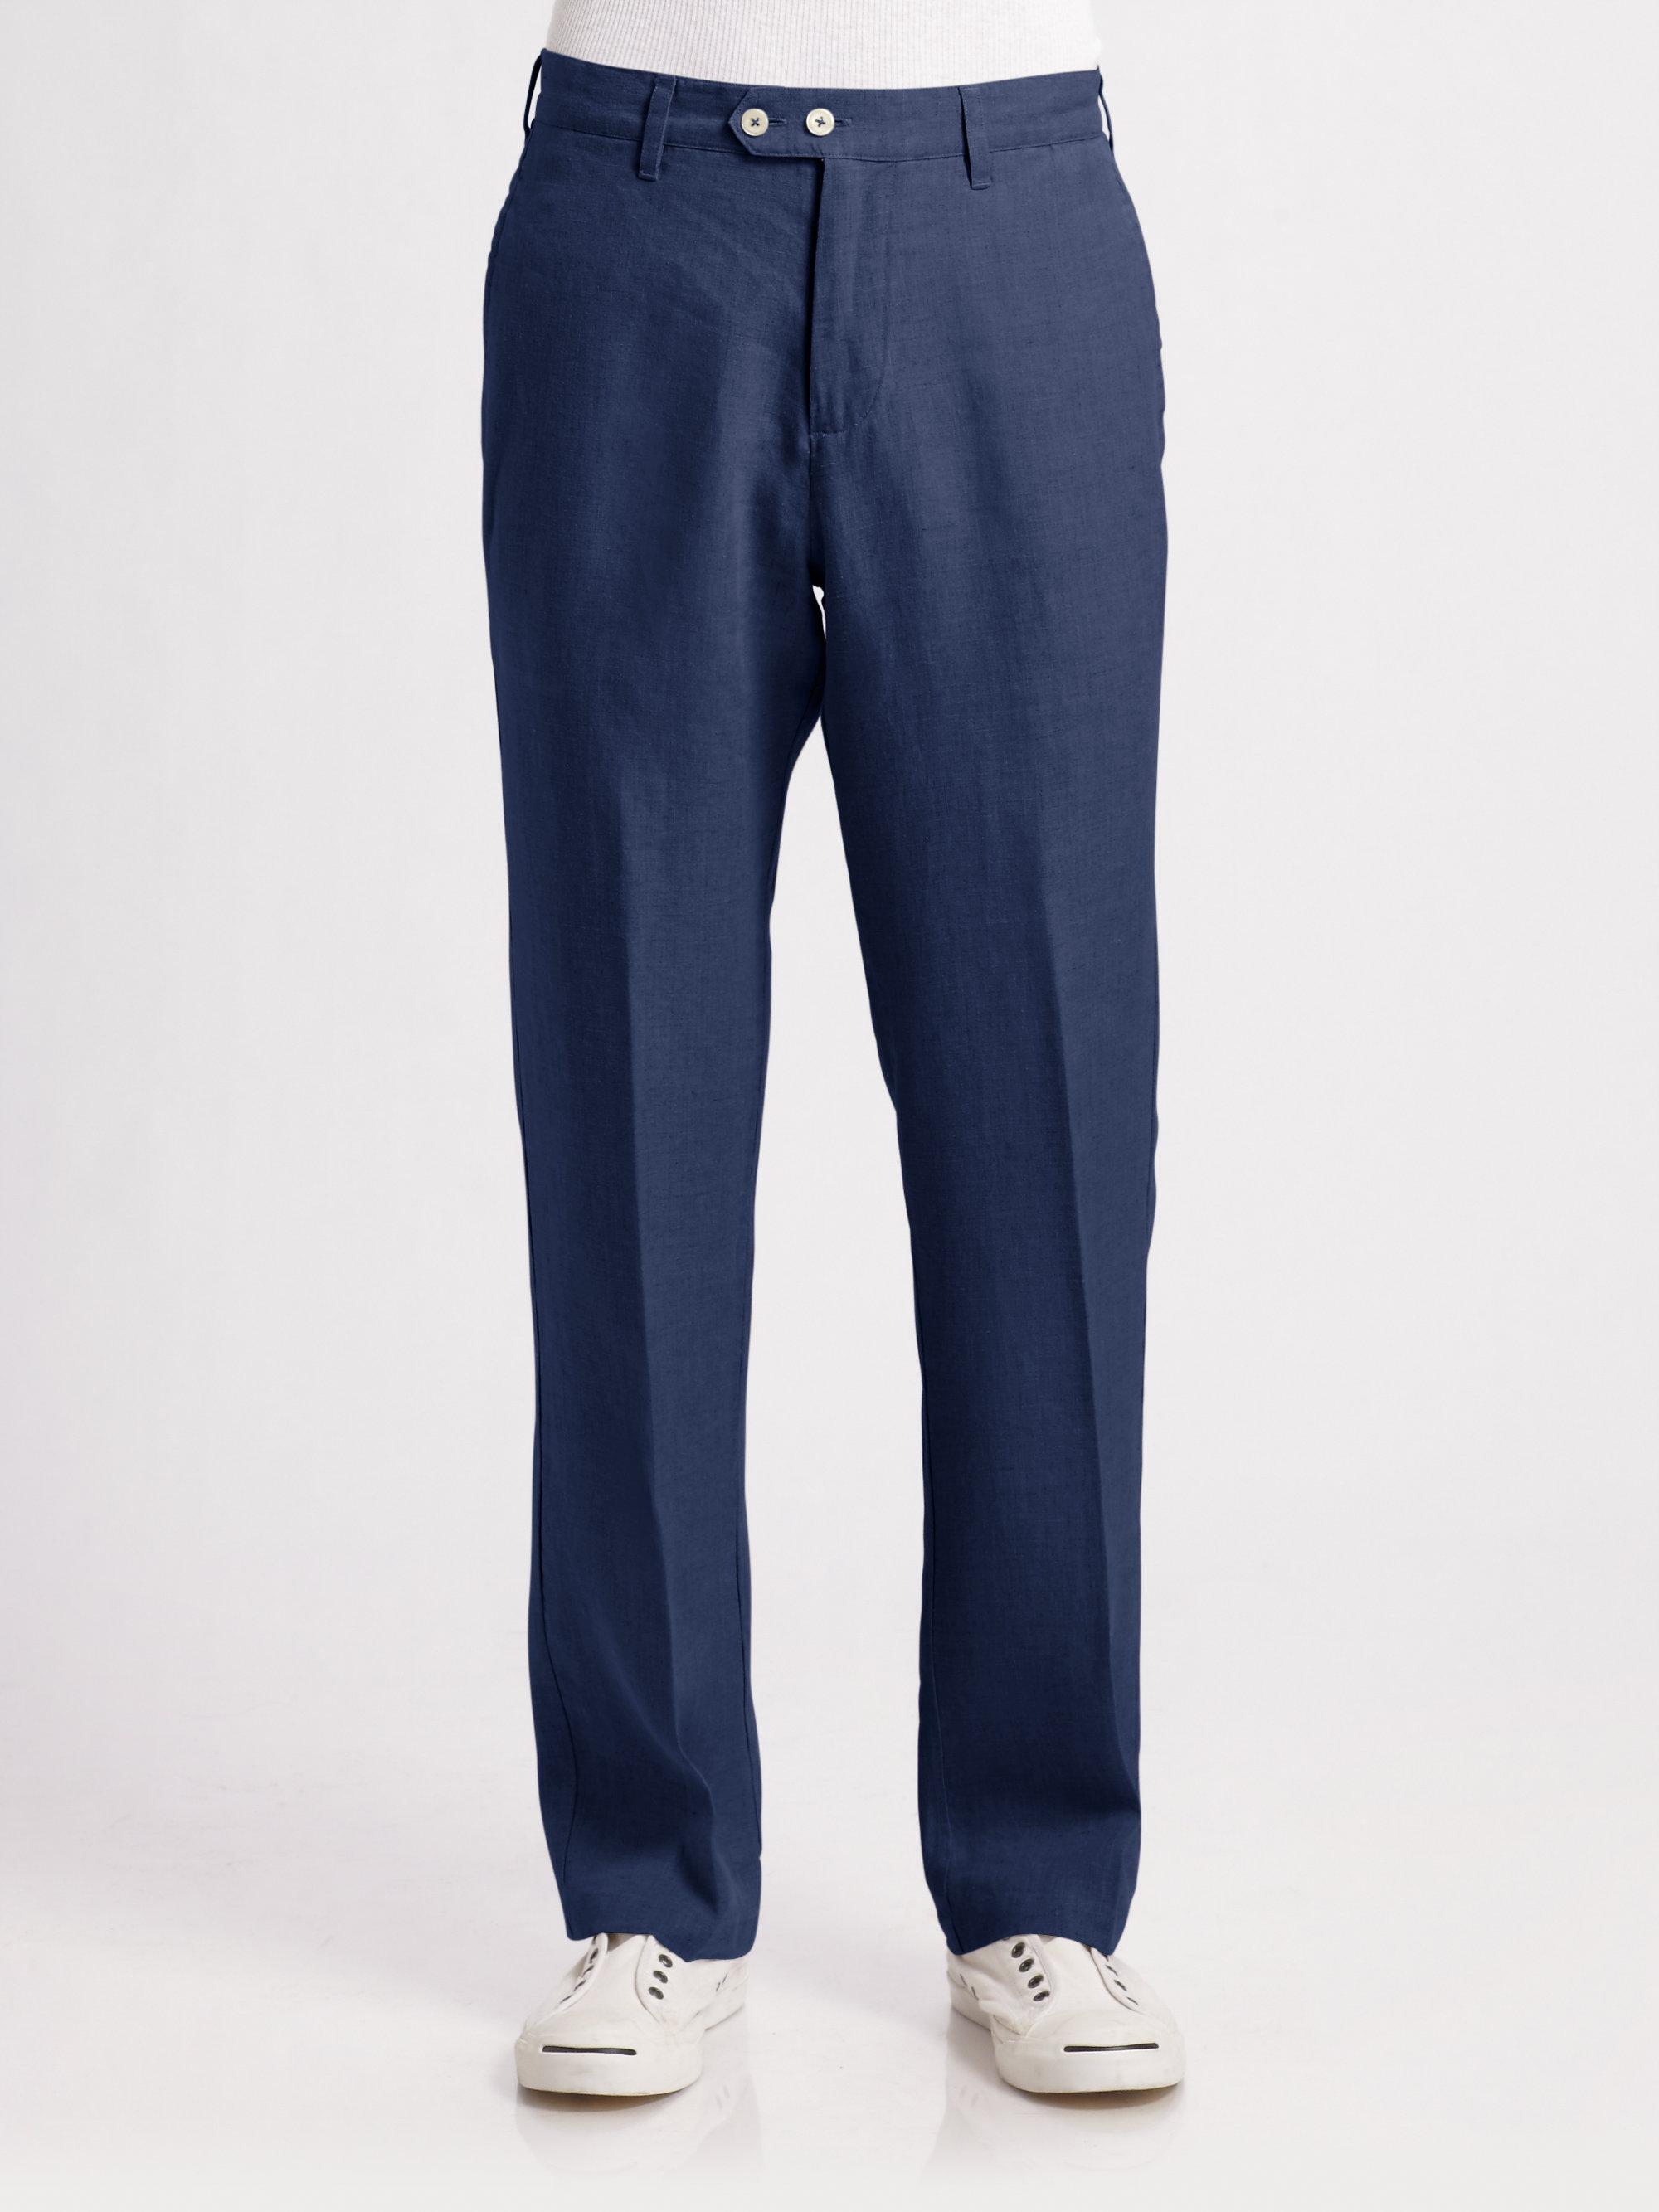 Saks Fifth Avenue Linen Pants In Blue For Men Lyst